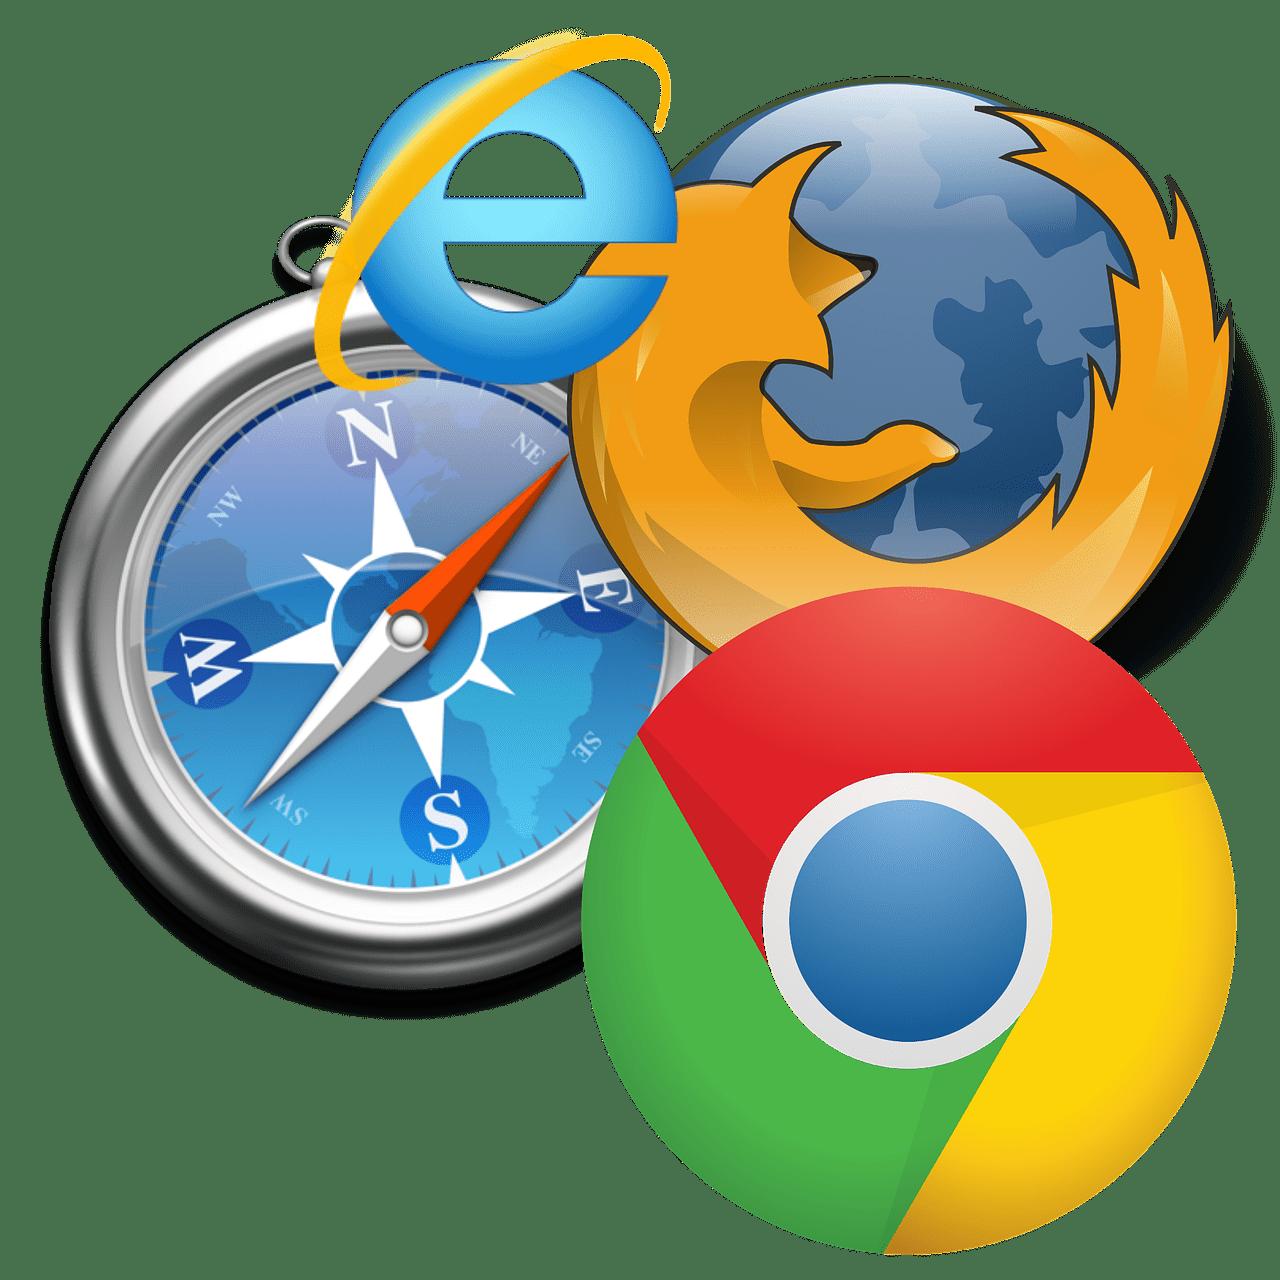 Как найти браузер в телефоне